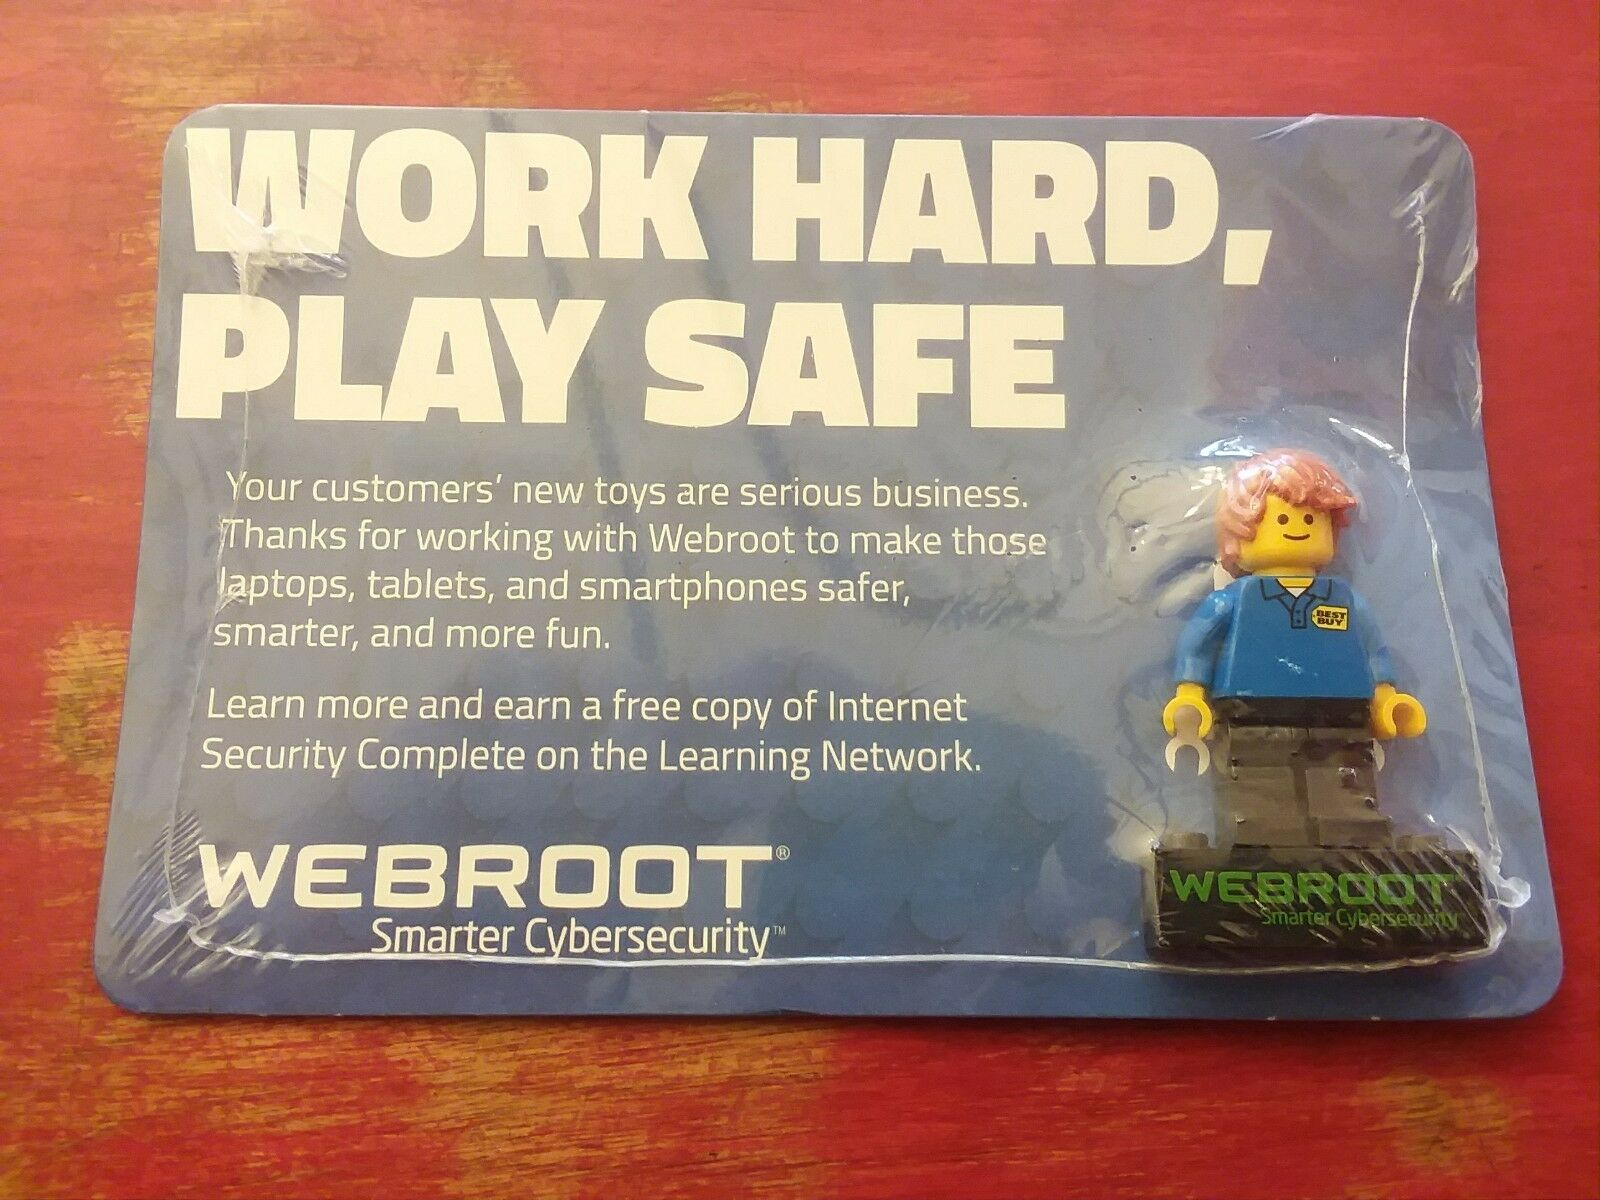 bäst Buy Exclusive Lego Minifigure New seled webroot Sällsynt i krymplinda